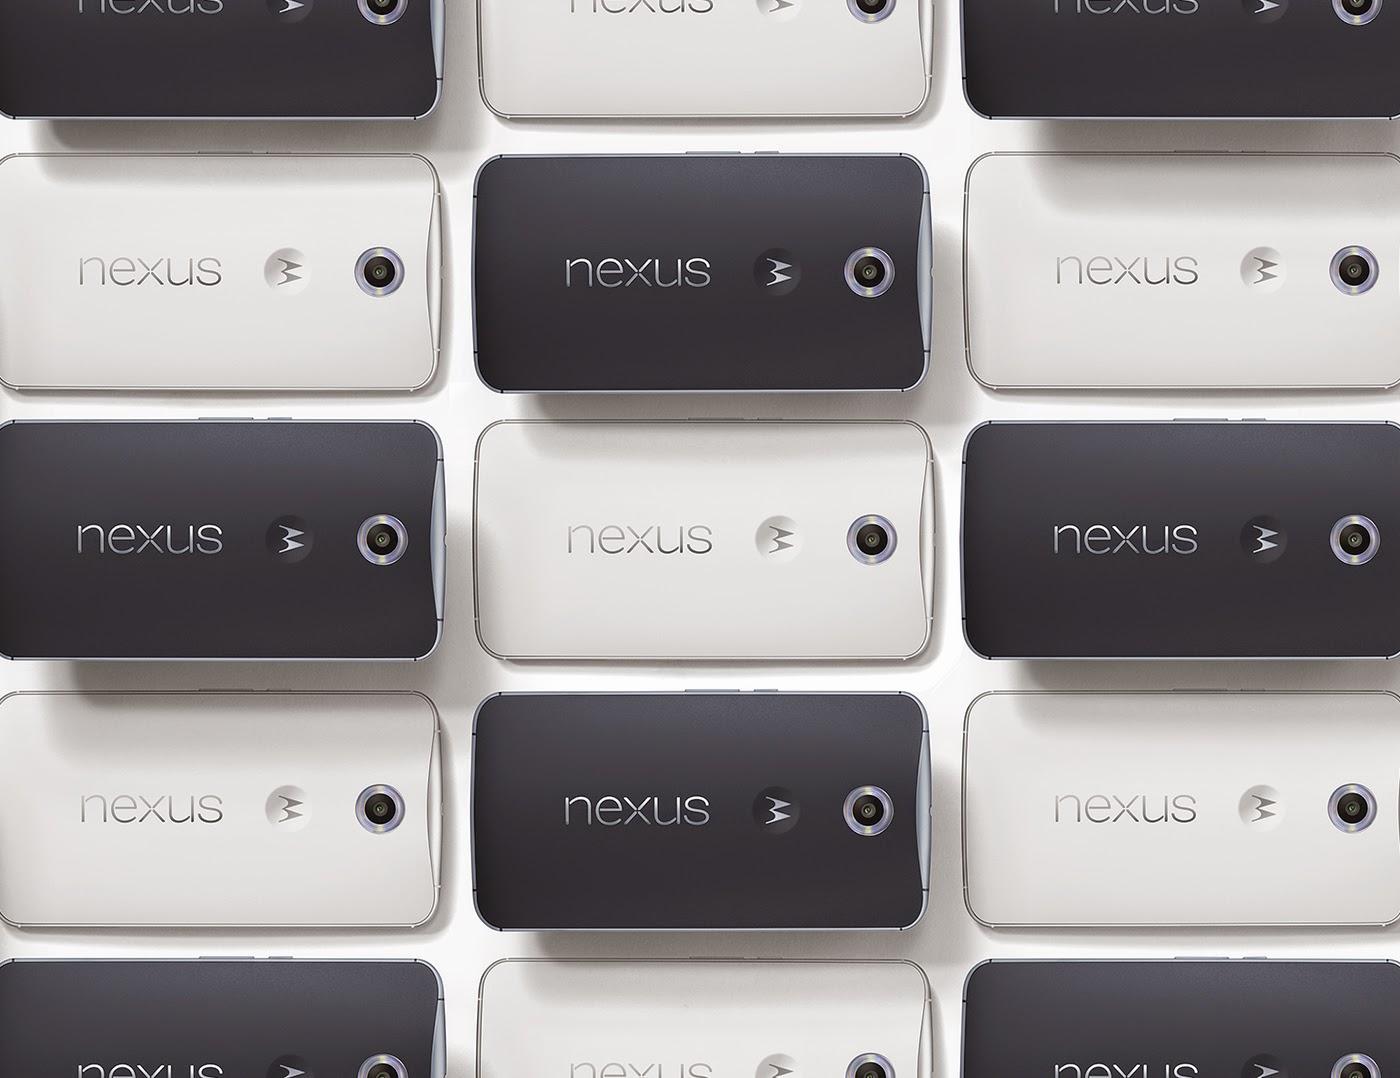 THE NEXUS 6 Google's latest Android smartphone